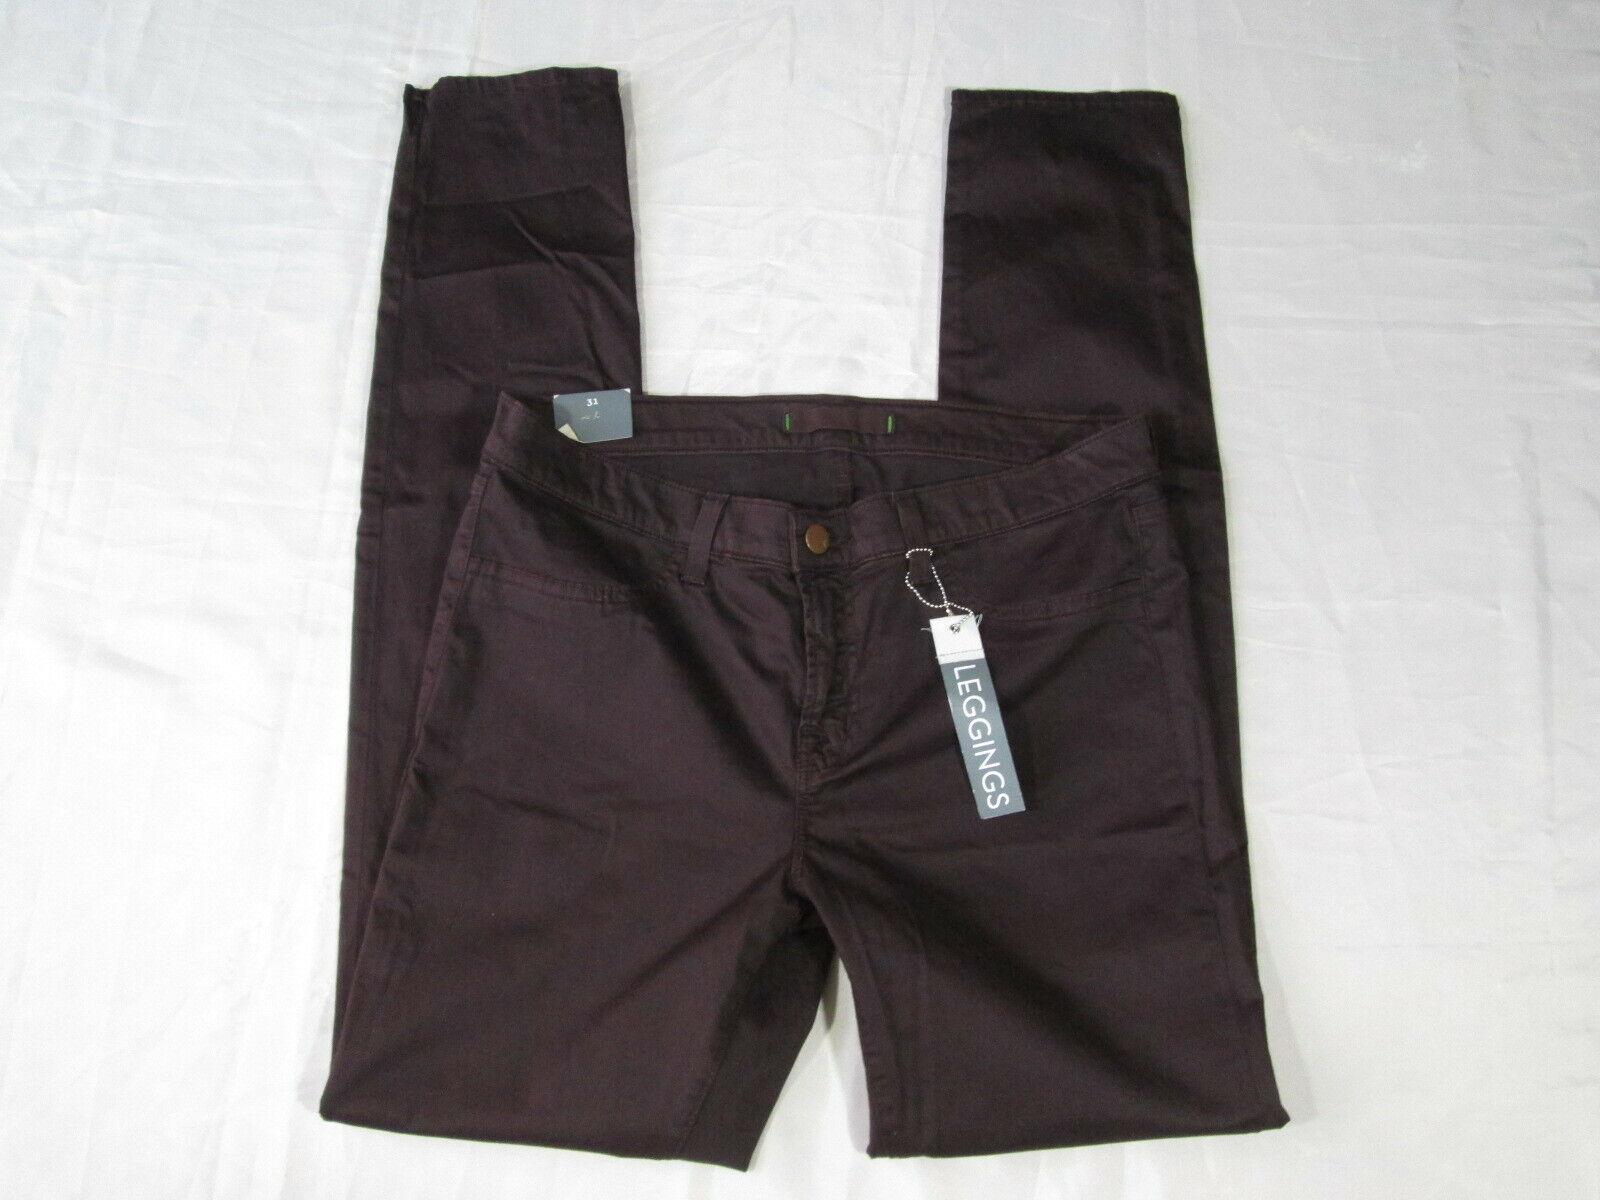 J Brand Leggings 901 Low Rise Skinny Leg Denim Jeans Wine Sz 31 NWT  302